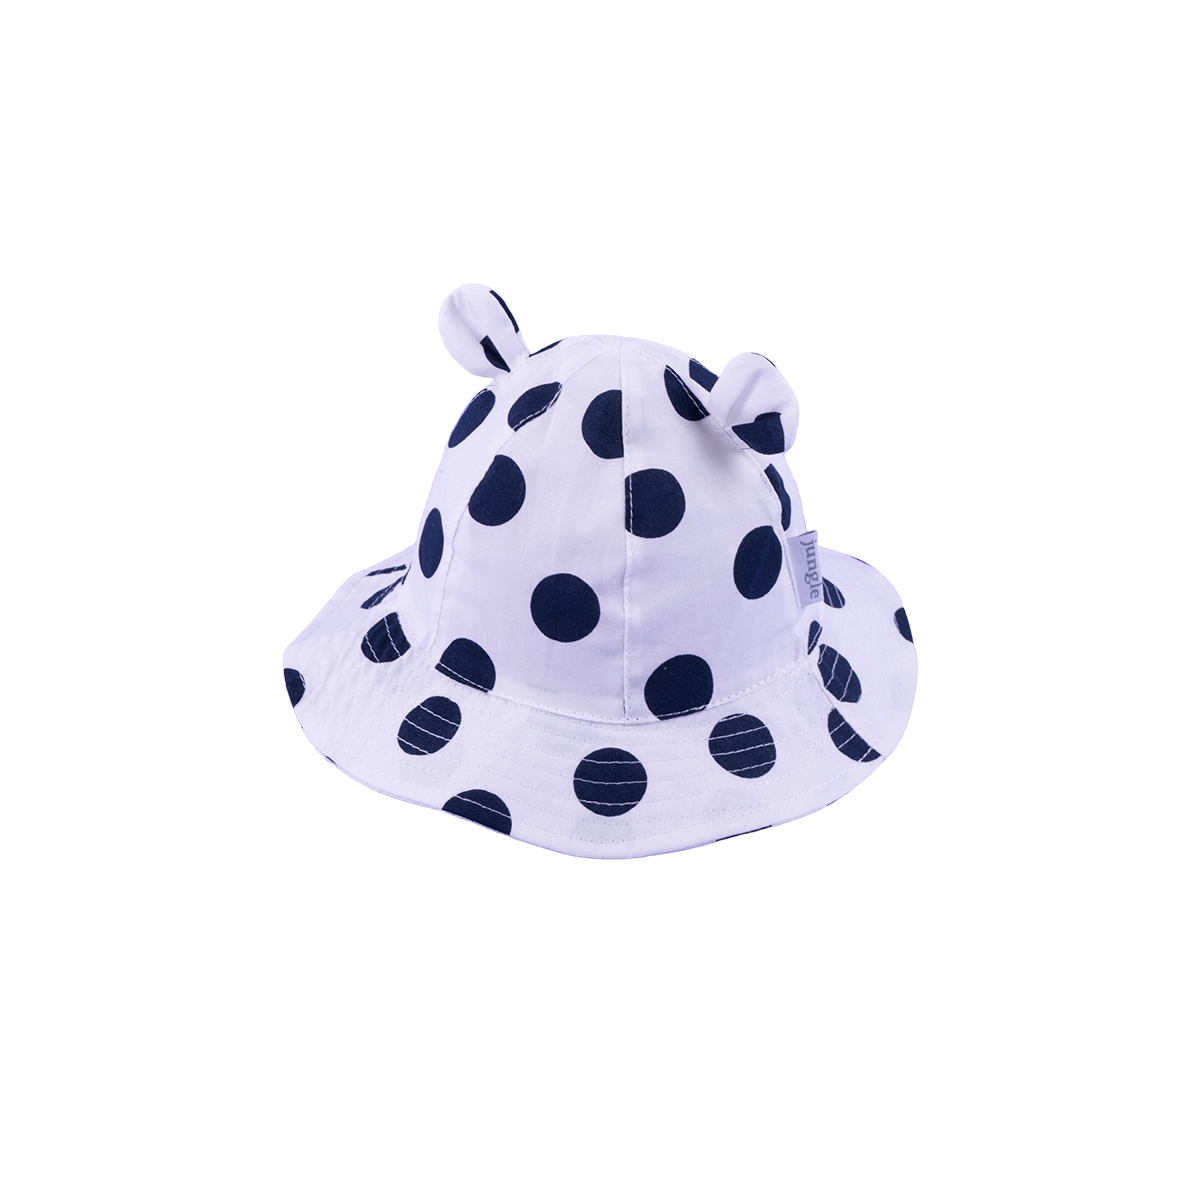 Jungle šešir S19-01, 42-48